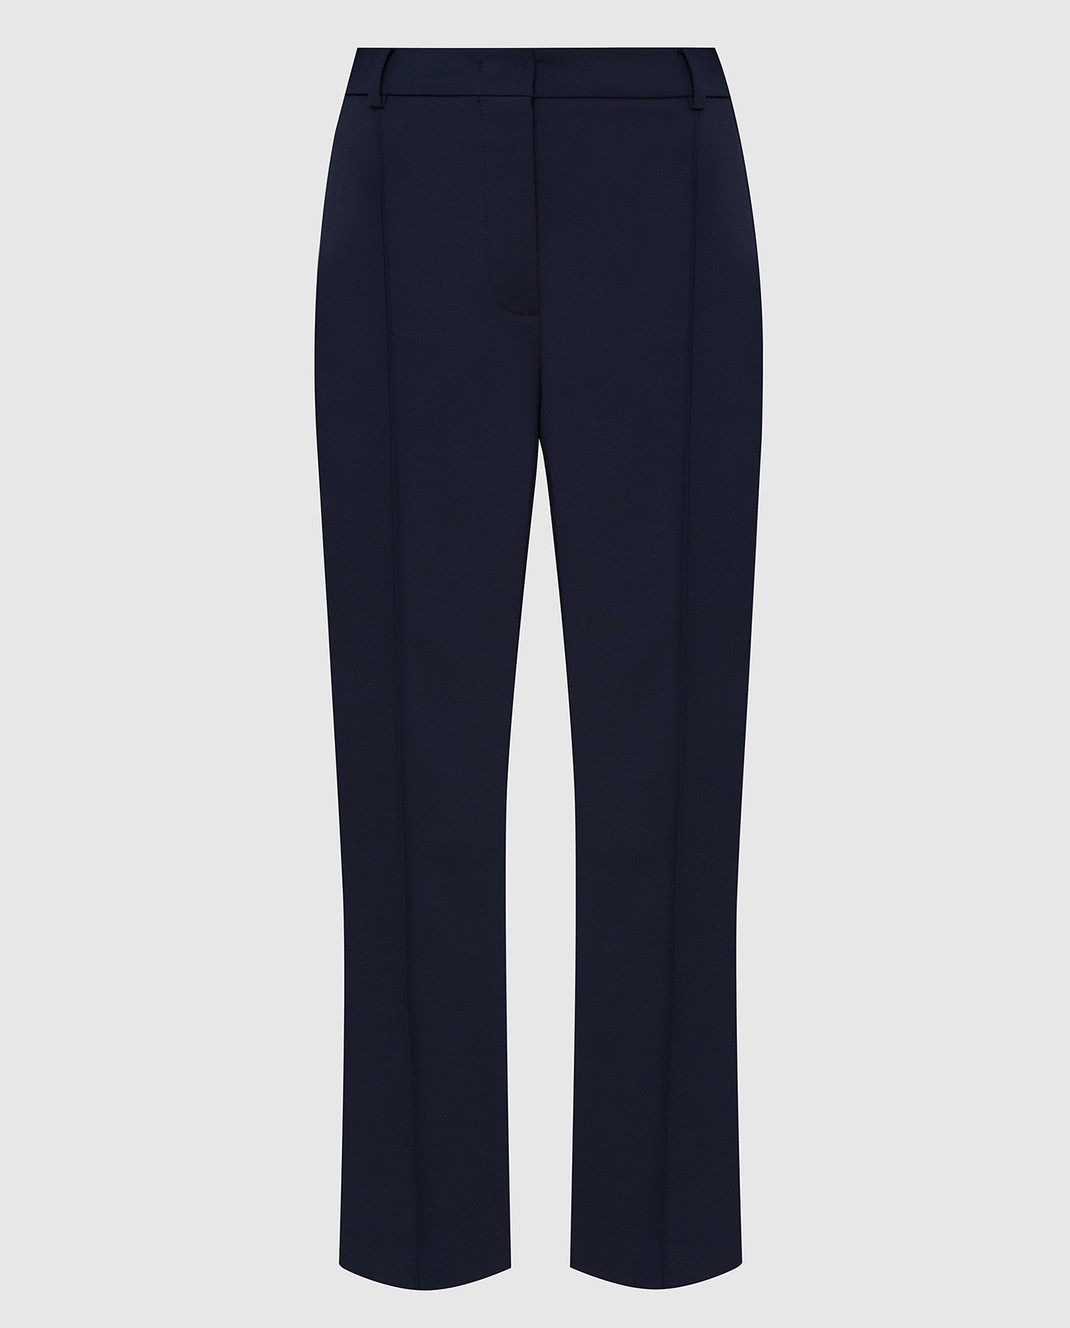 Max Mara Sportmax Темно-синие брюки FATA